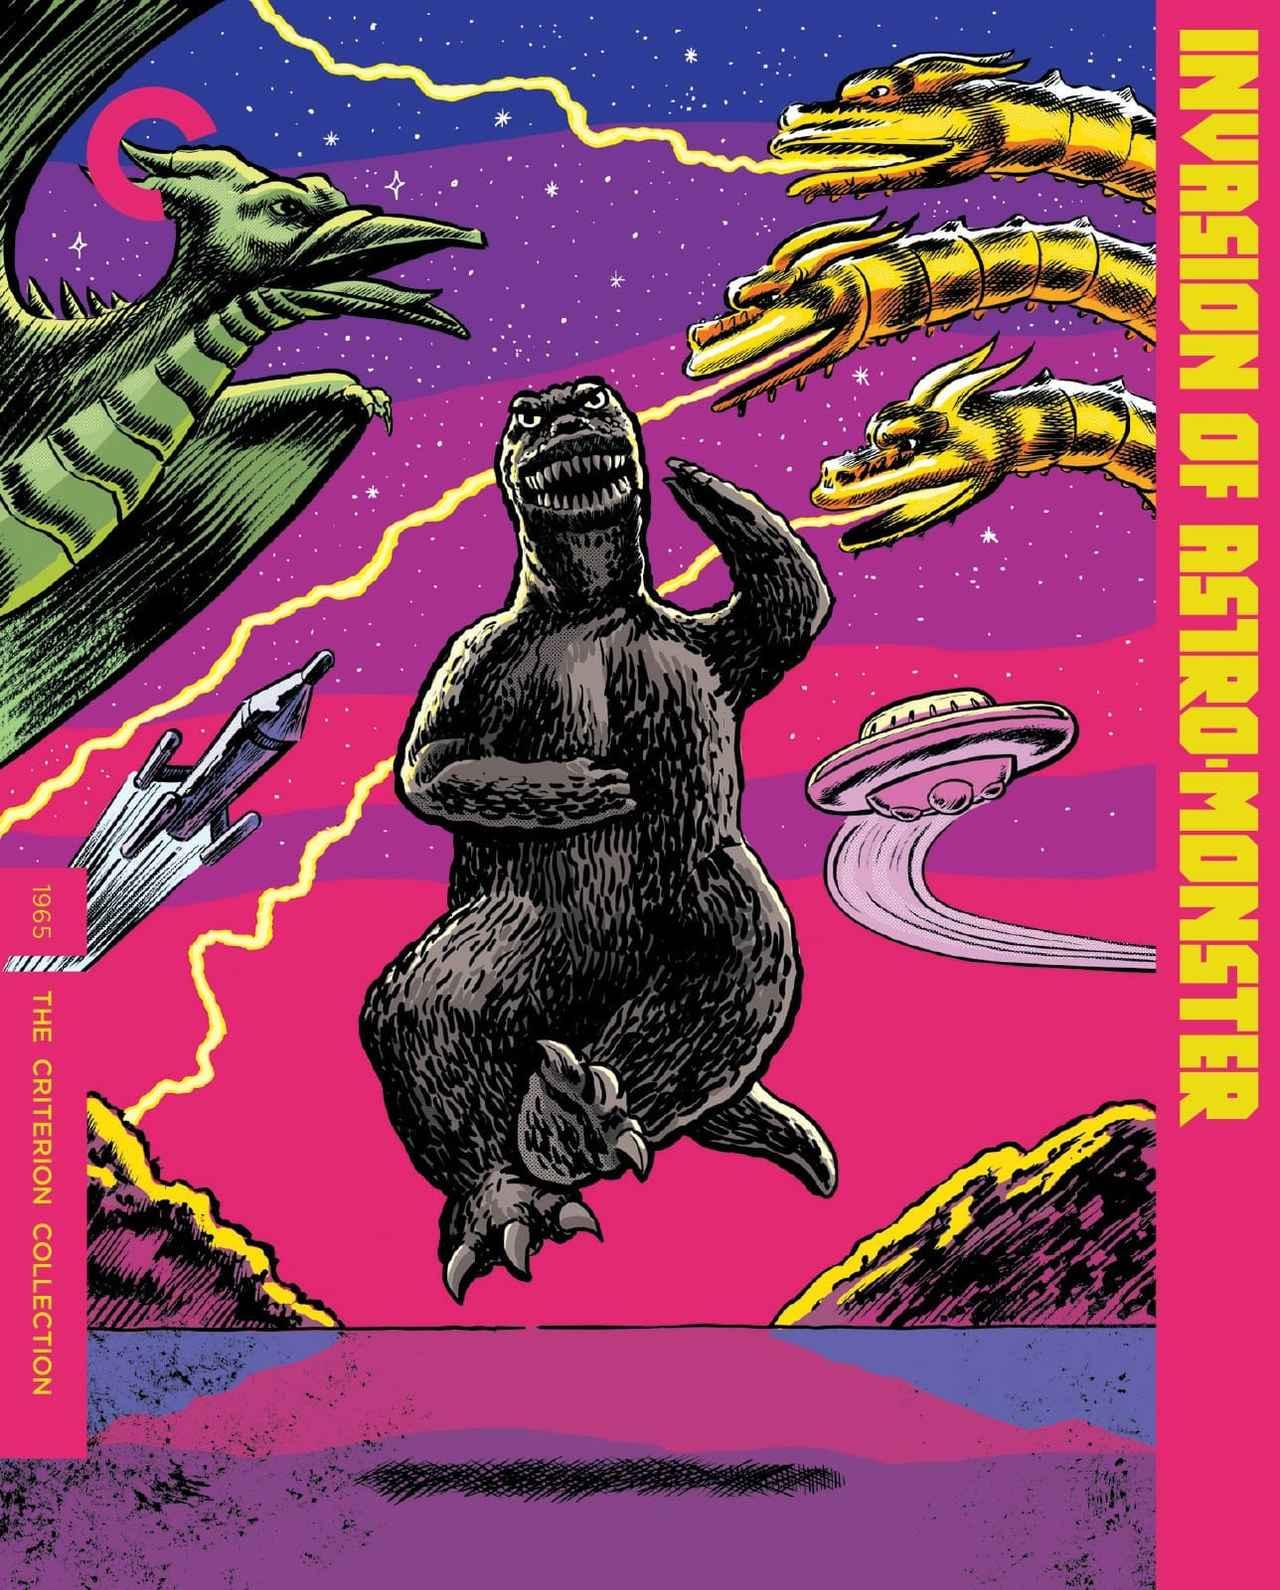 画像: 怪獣大戦争(1965) シリーズ第6作